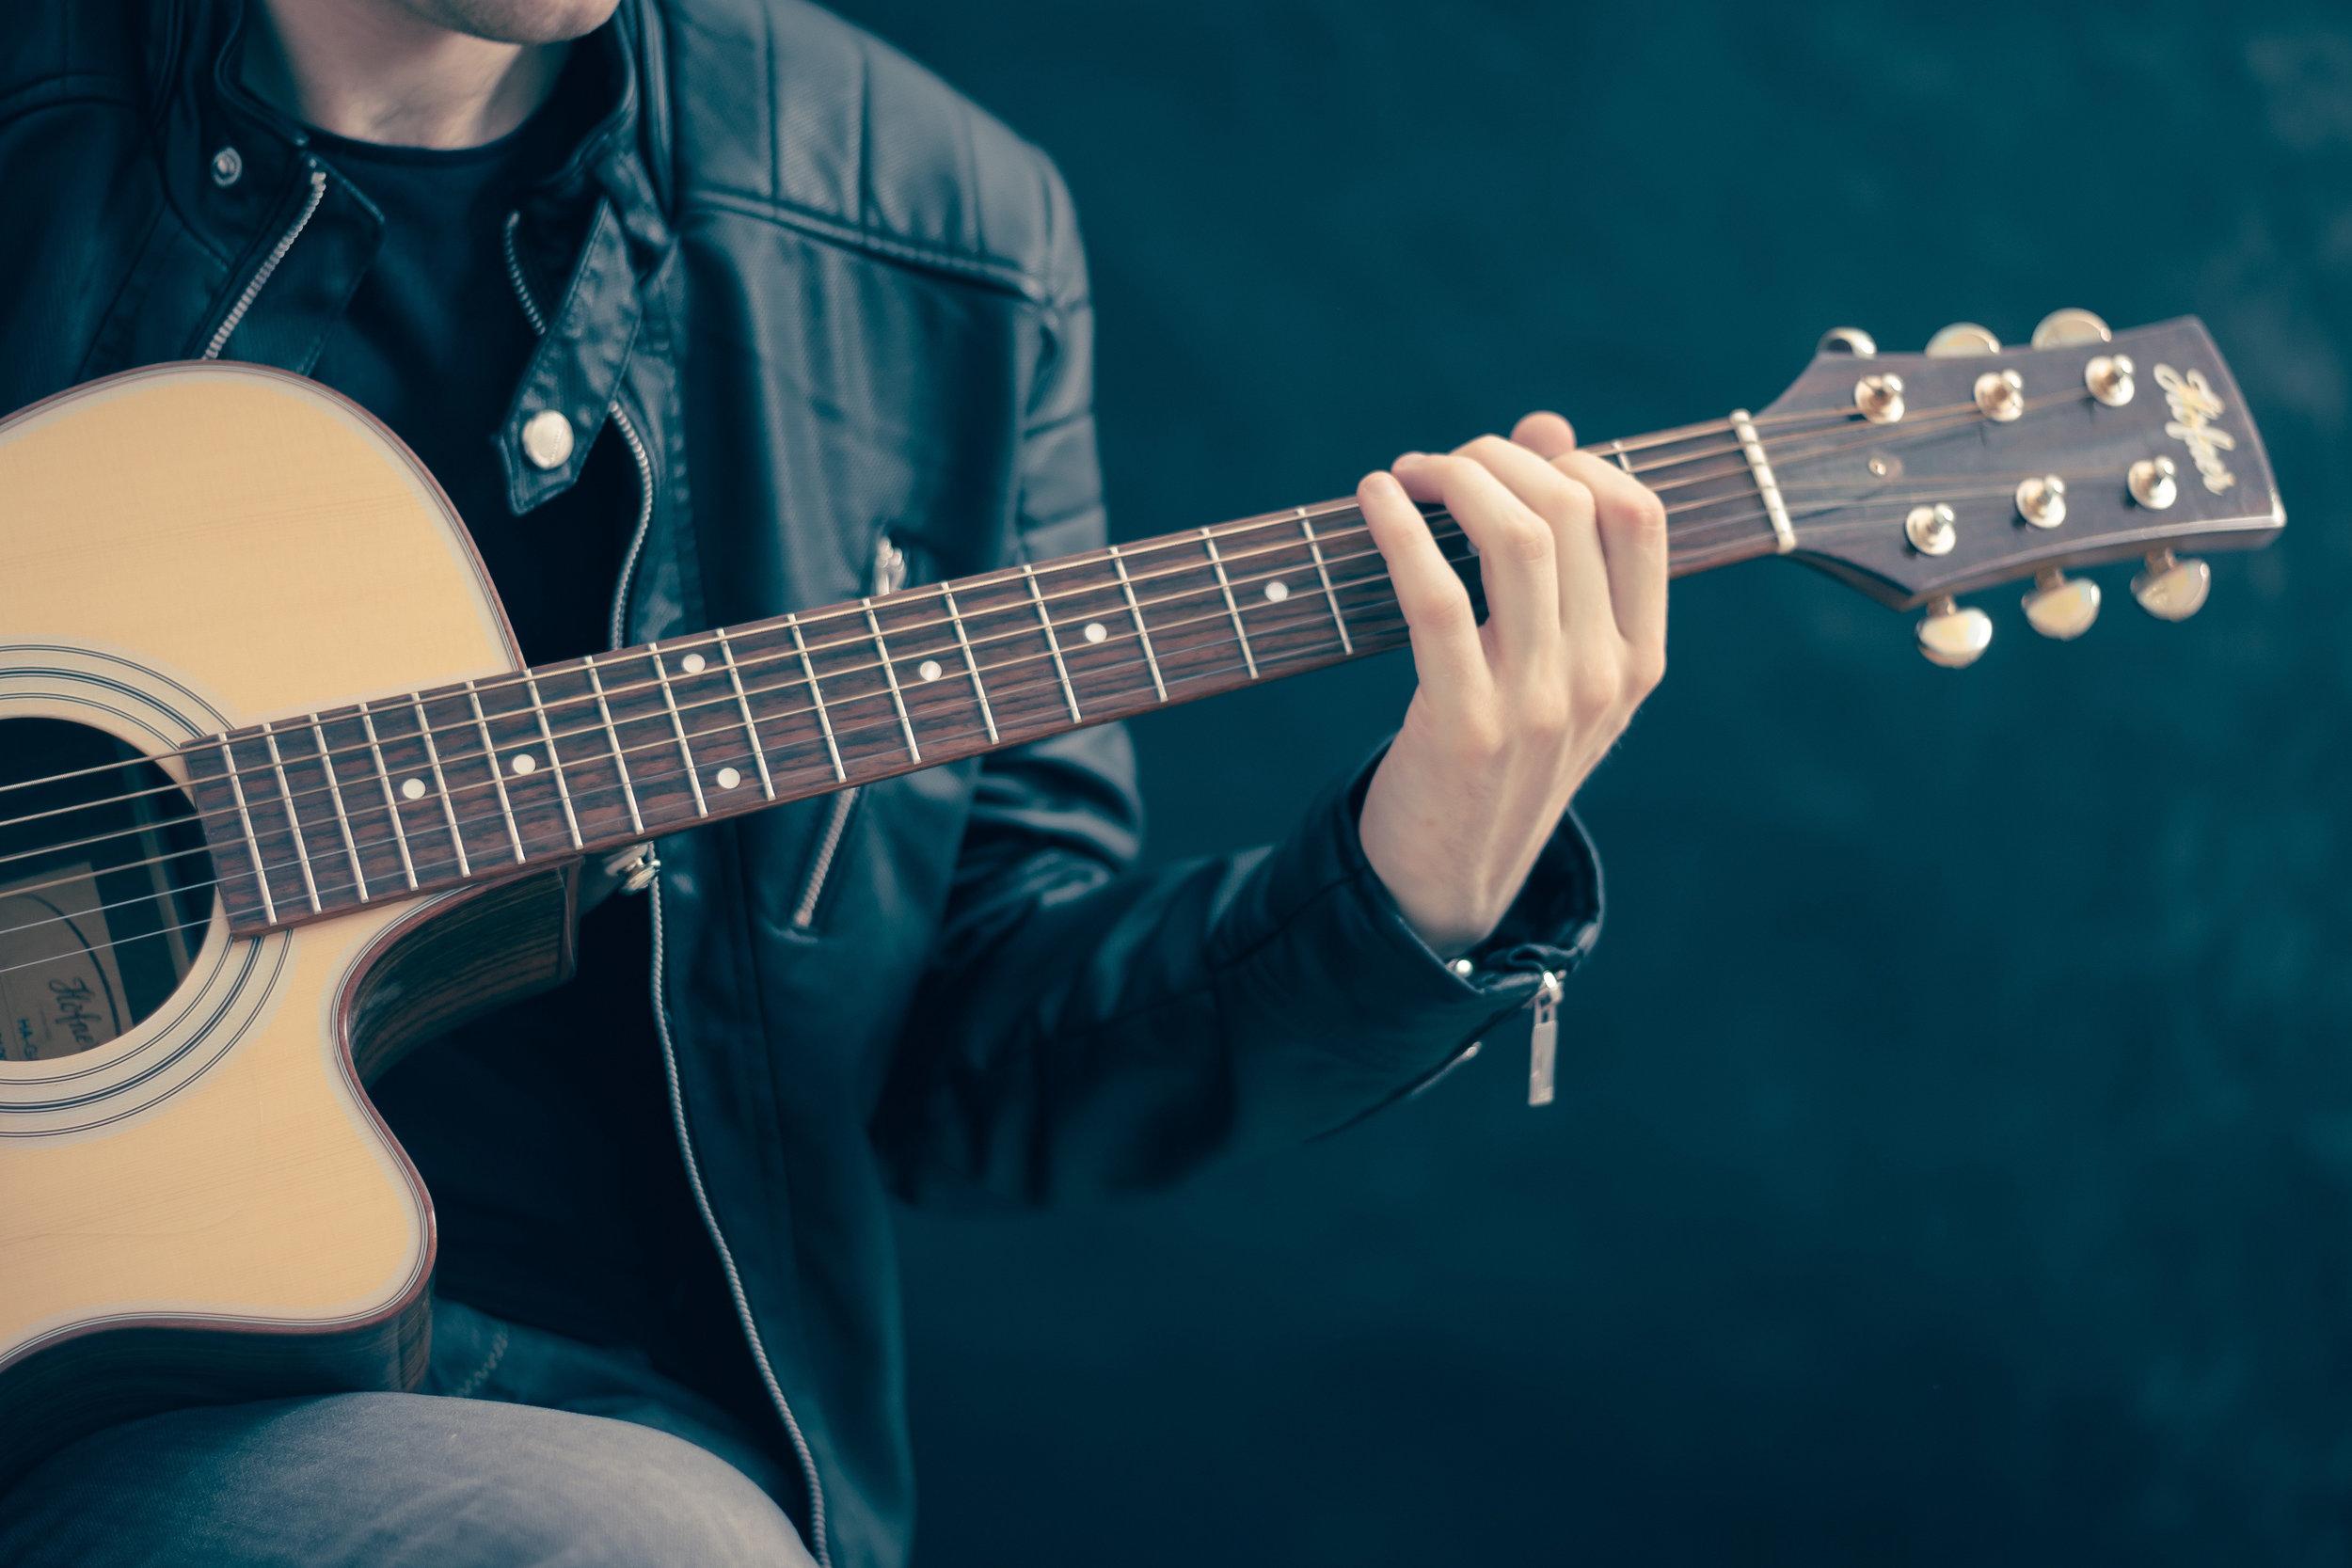 guitar-man.jpg